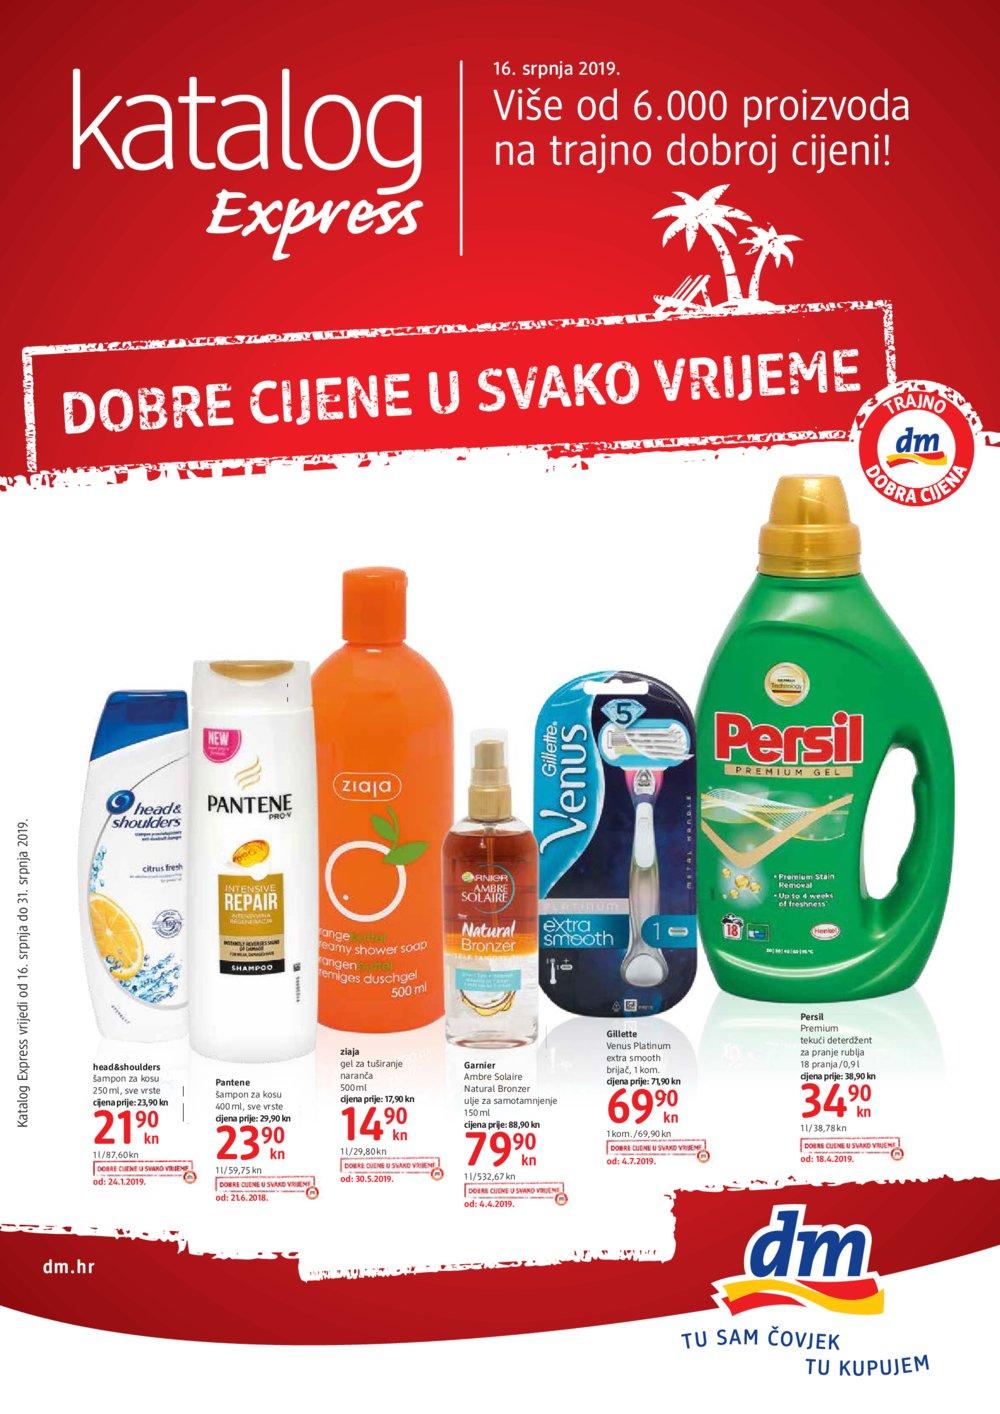 DM katalog Express 16.07.-31.07.2019.